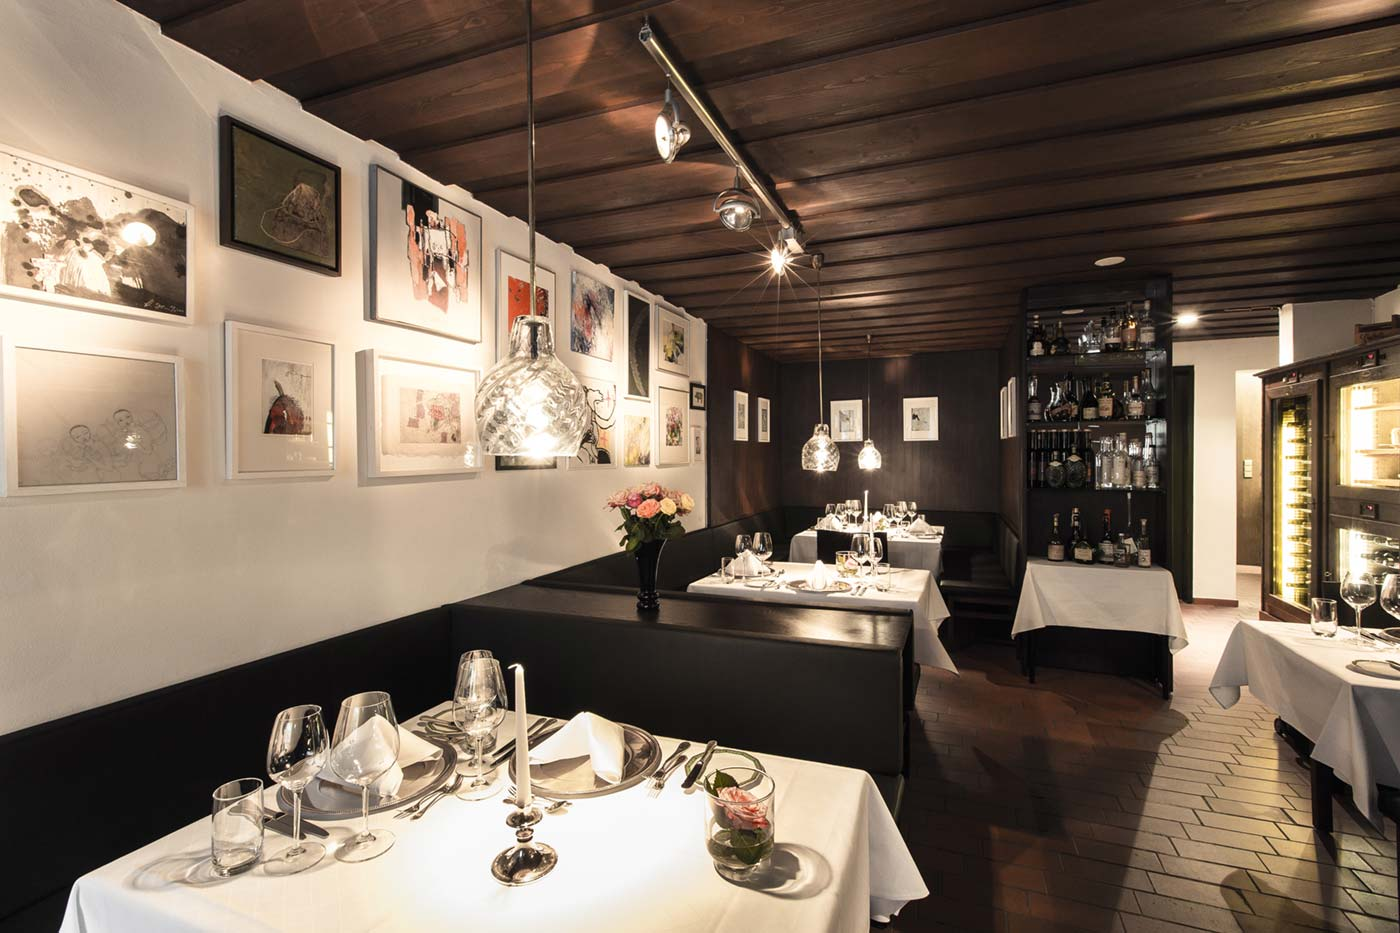 Ecke Restaurant Augsburg - Innenansicht linker Flügel